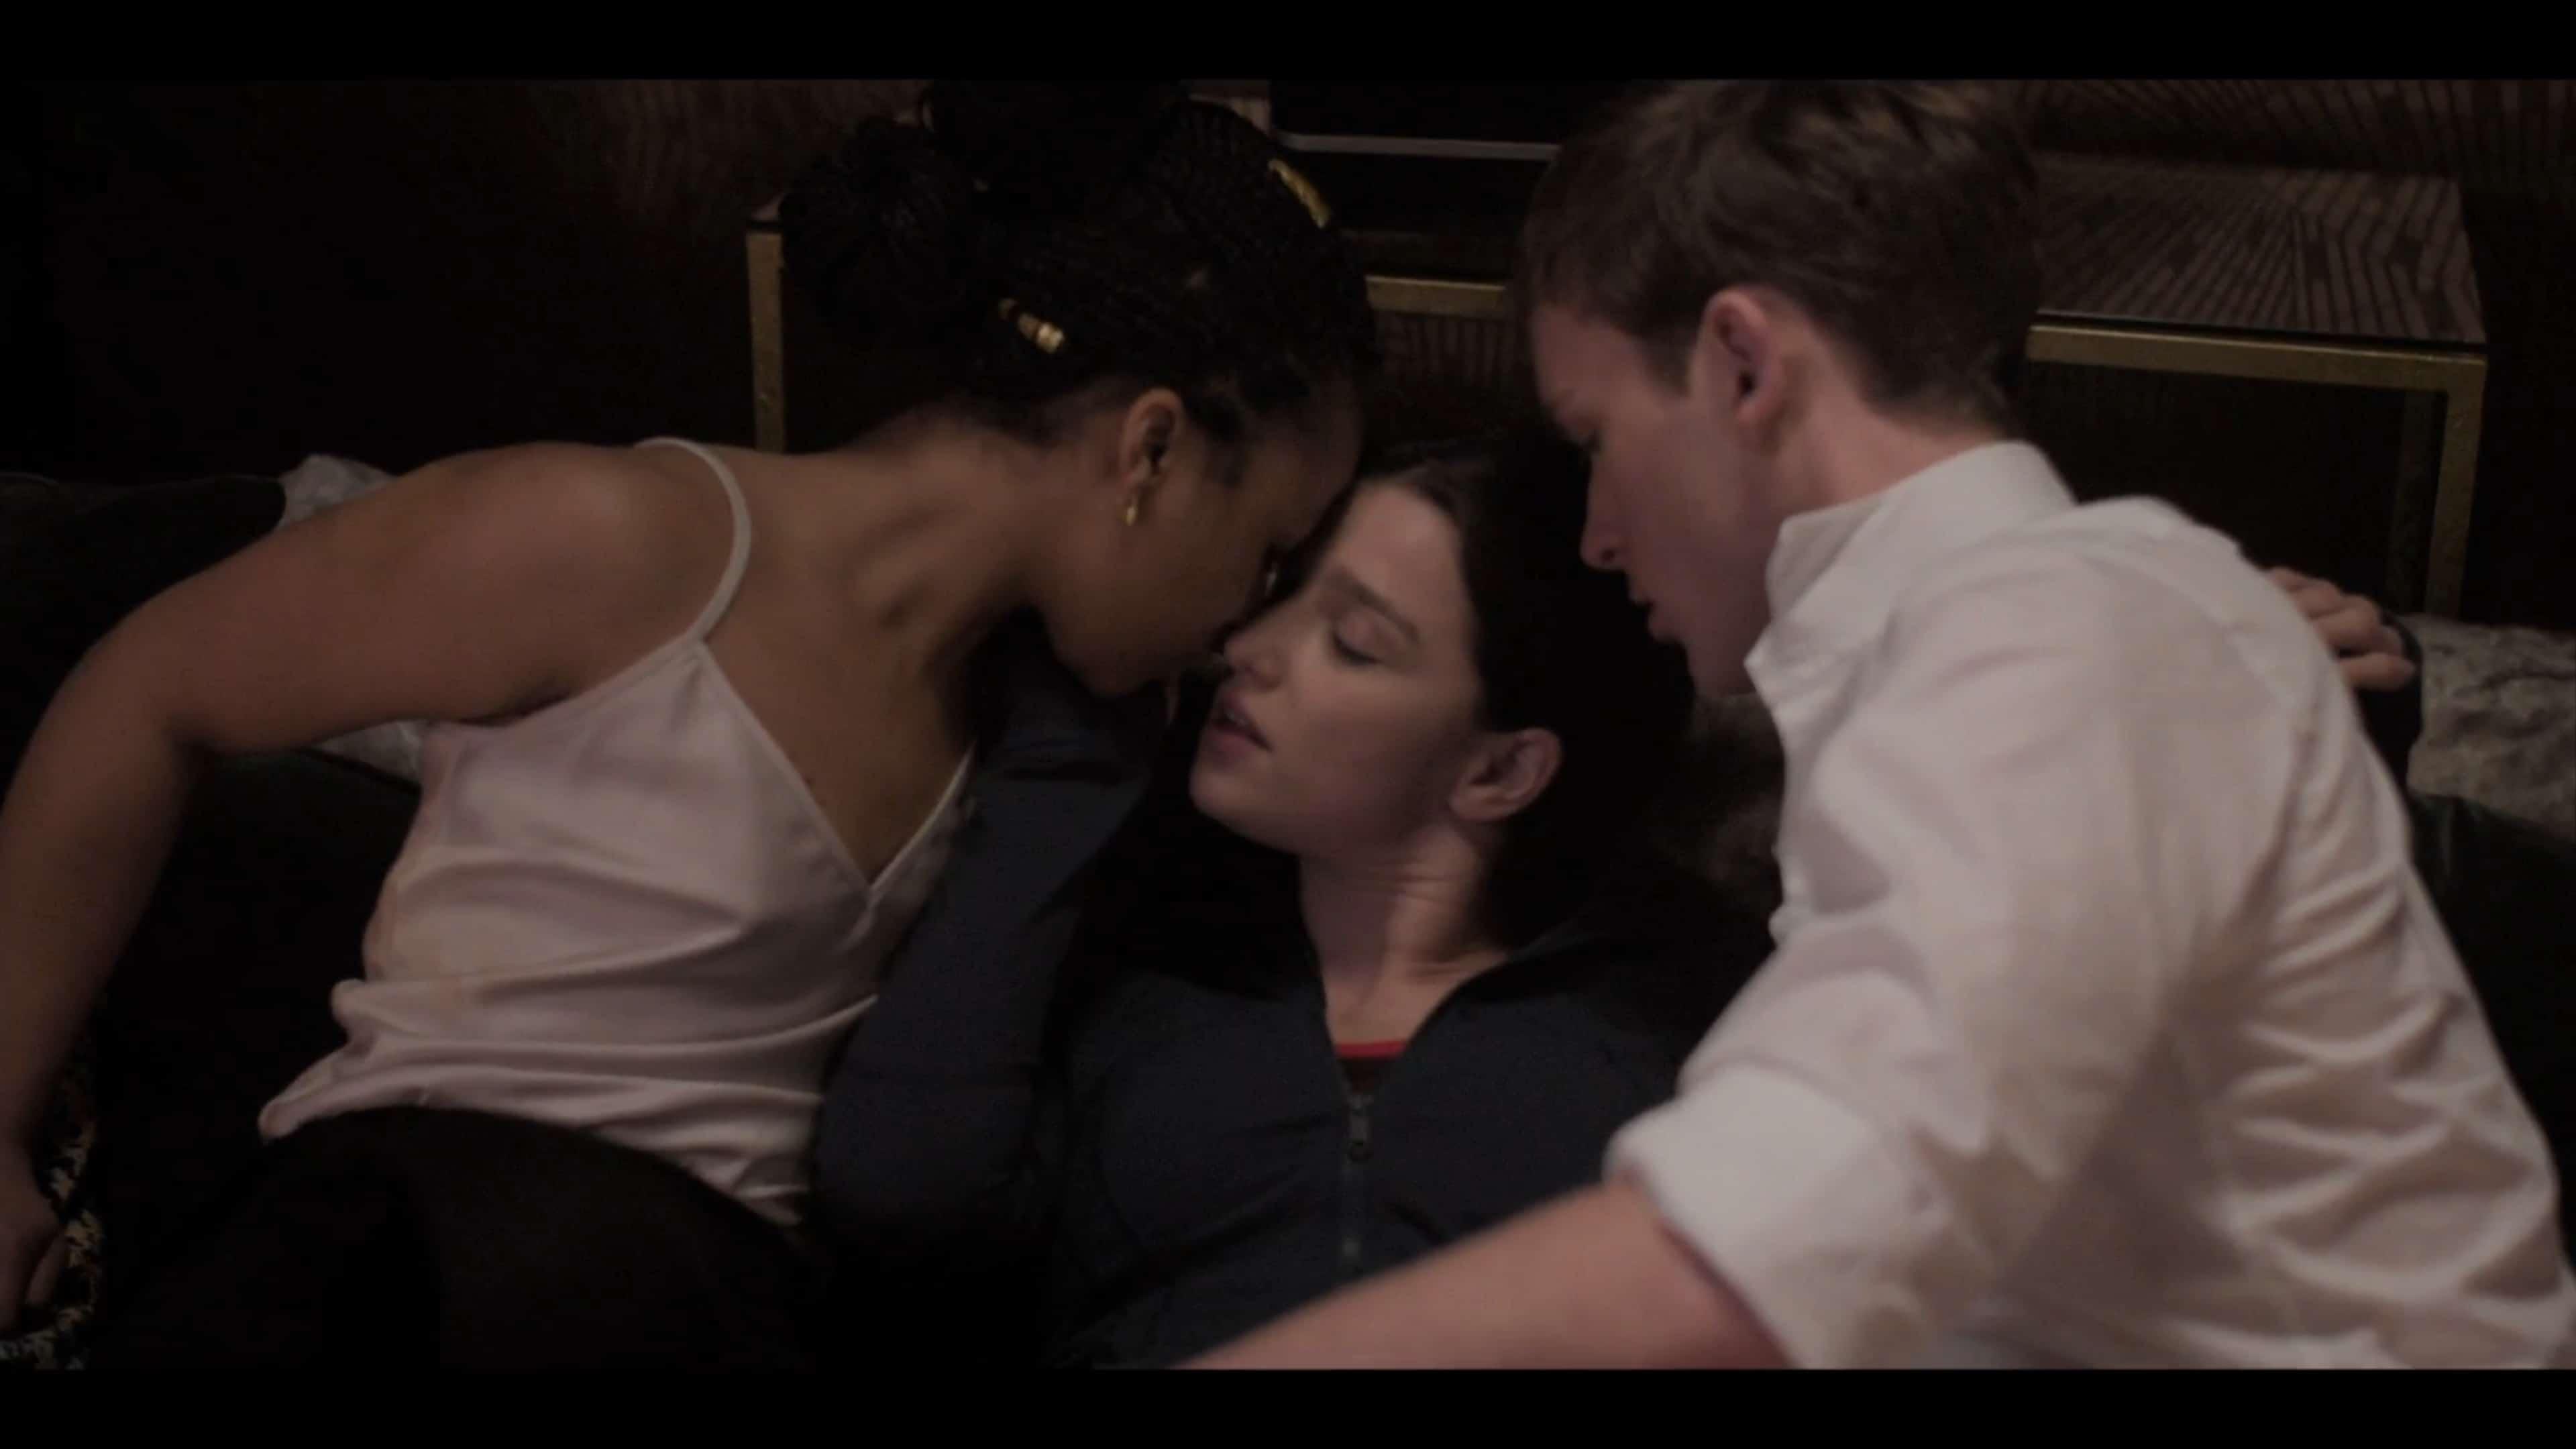 Harper, Yasmin, and Robert beginning a threesome